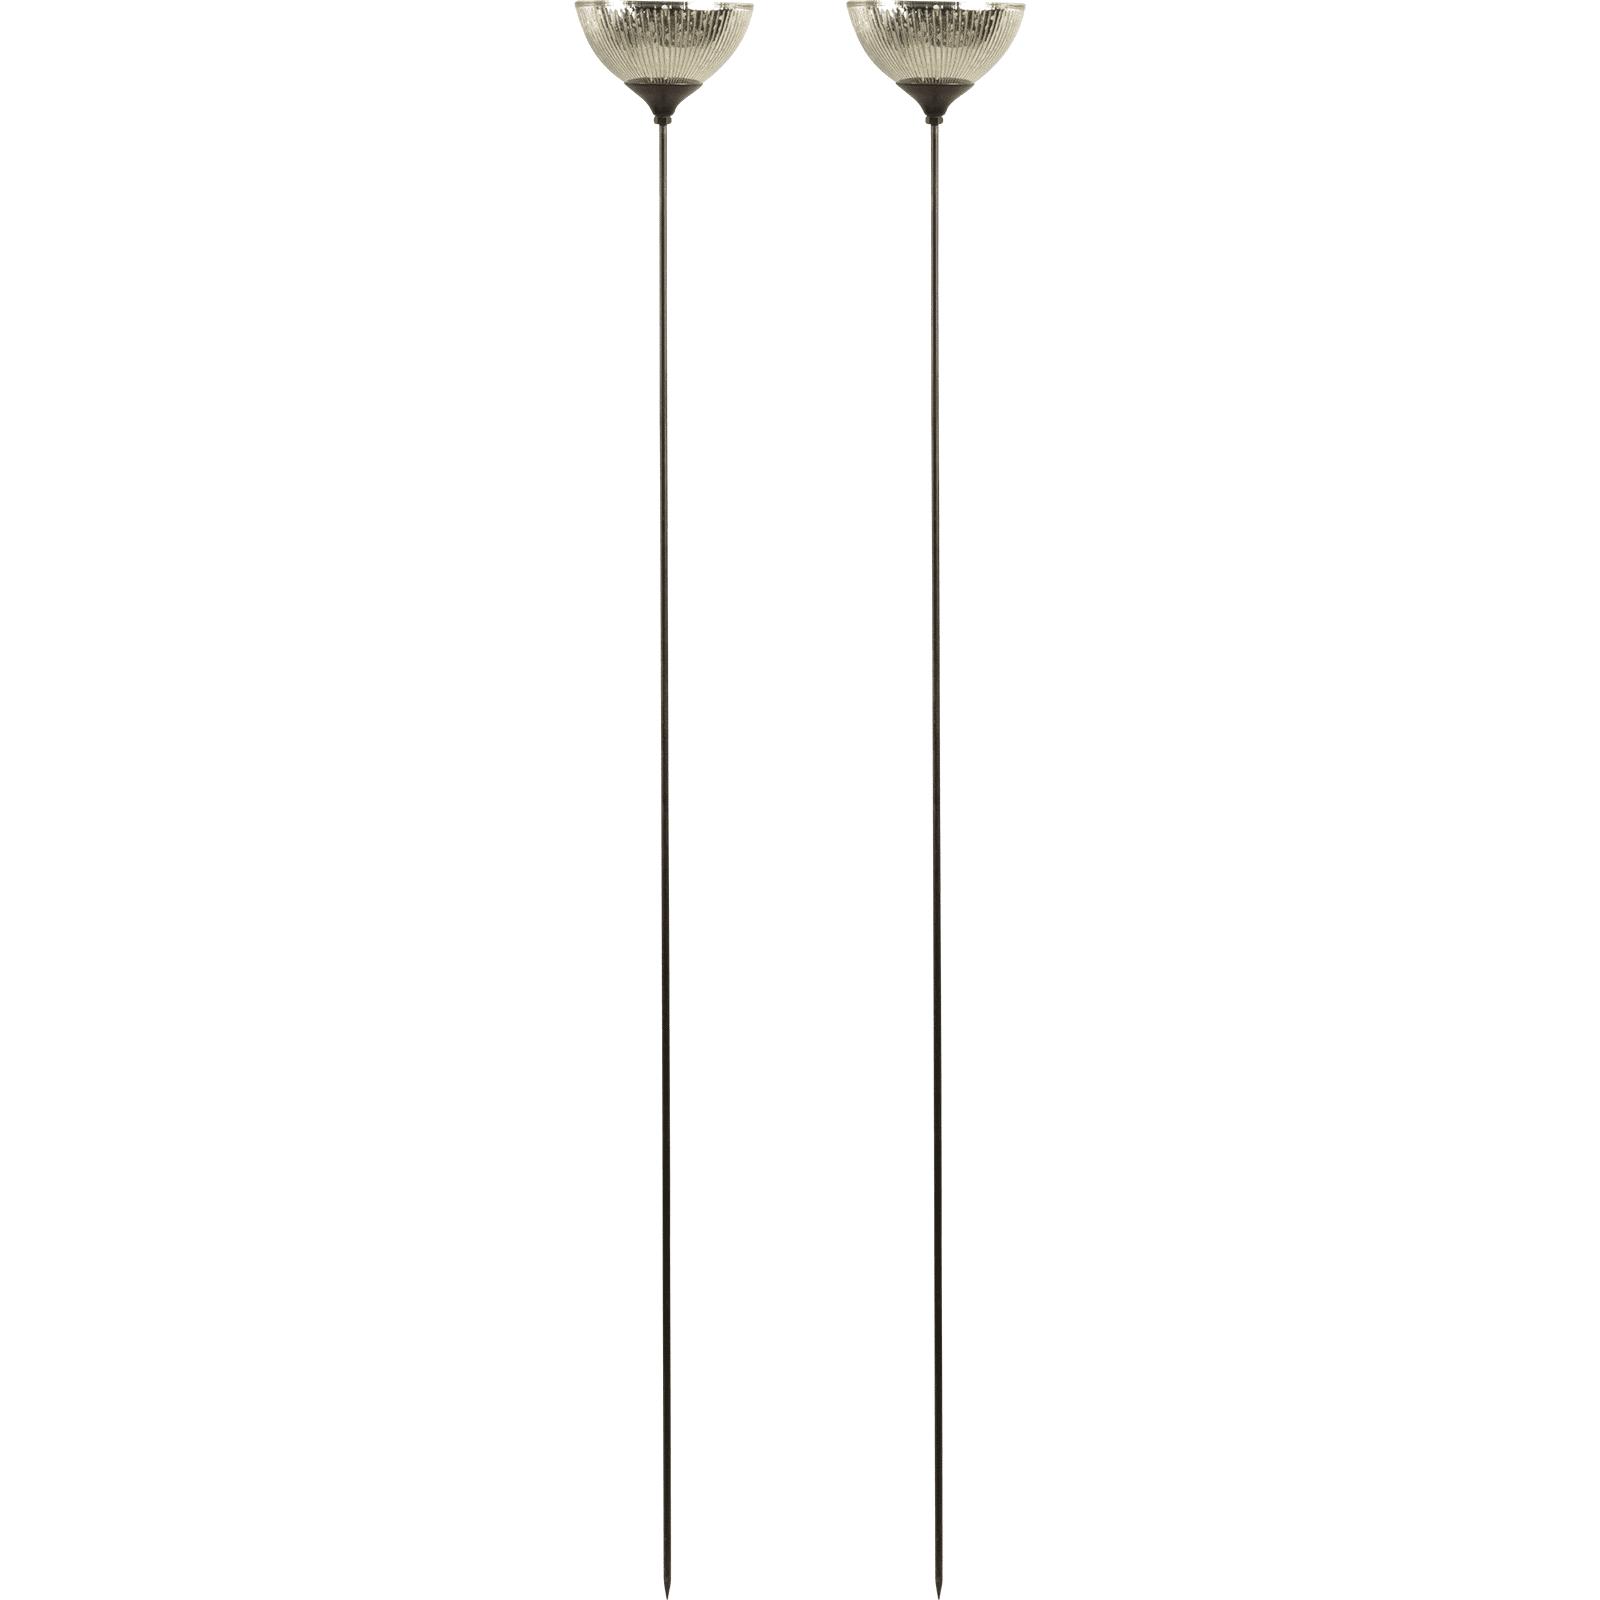 Nkuku Jasmine Garden Lanterns Set of 2